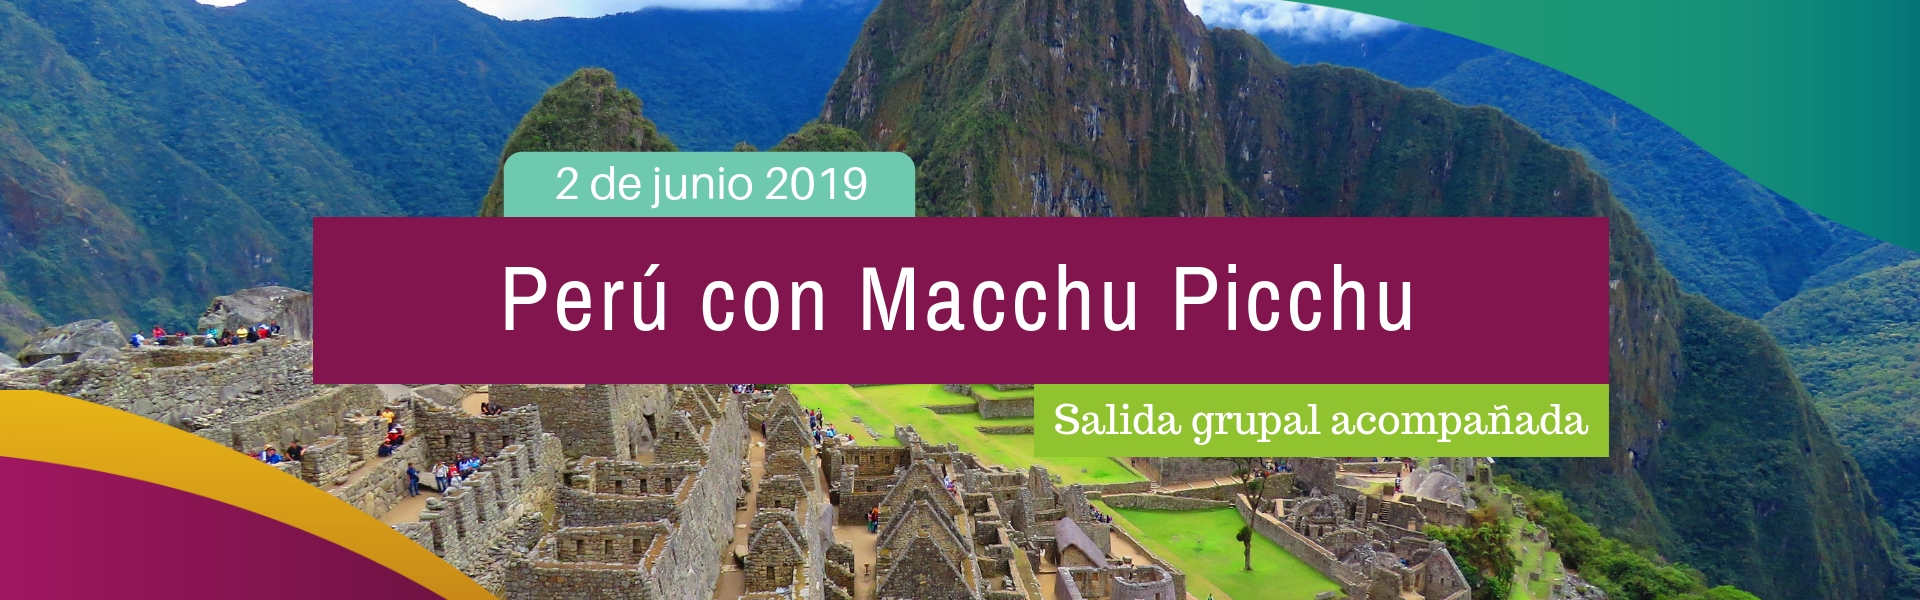 MACHU PICCHU - SALIDA GRUPAL ACOMPAÑADA 2-6-2019